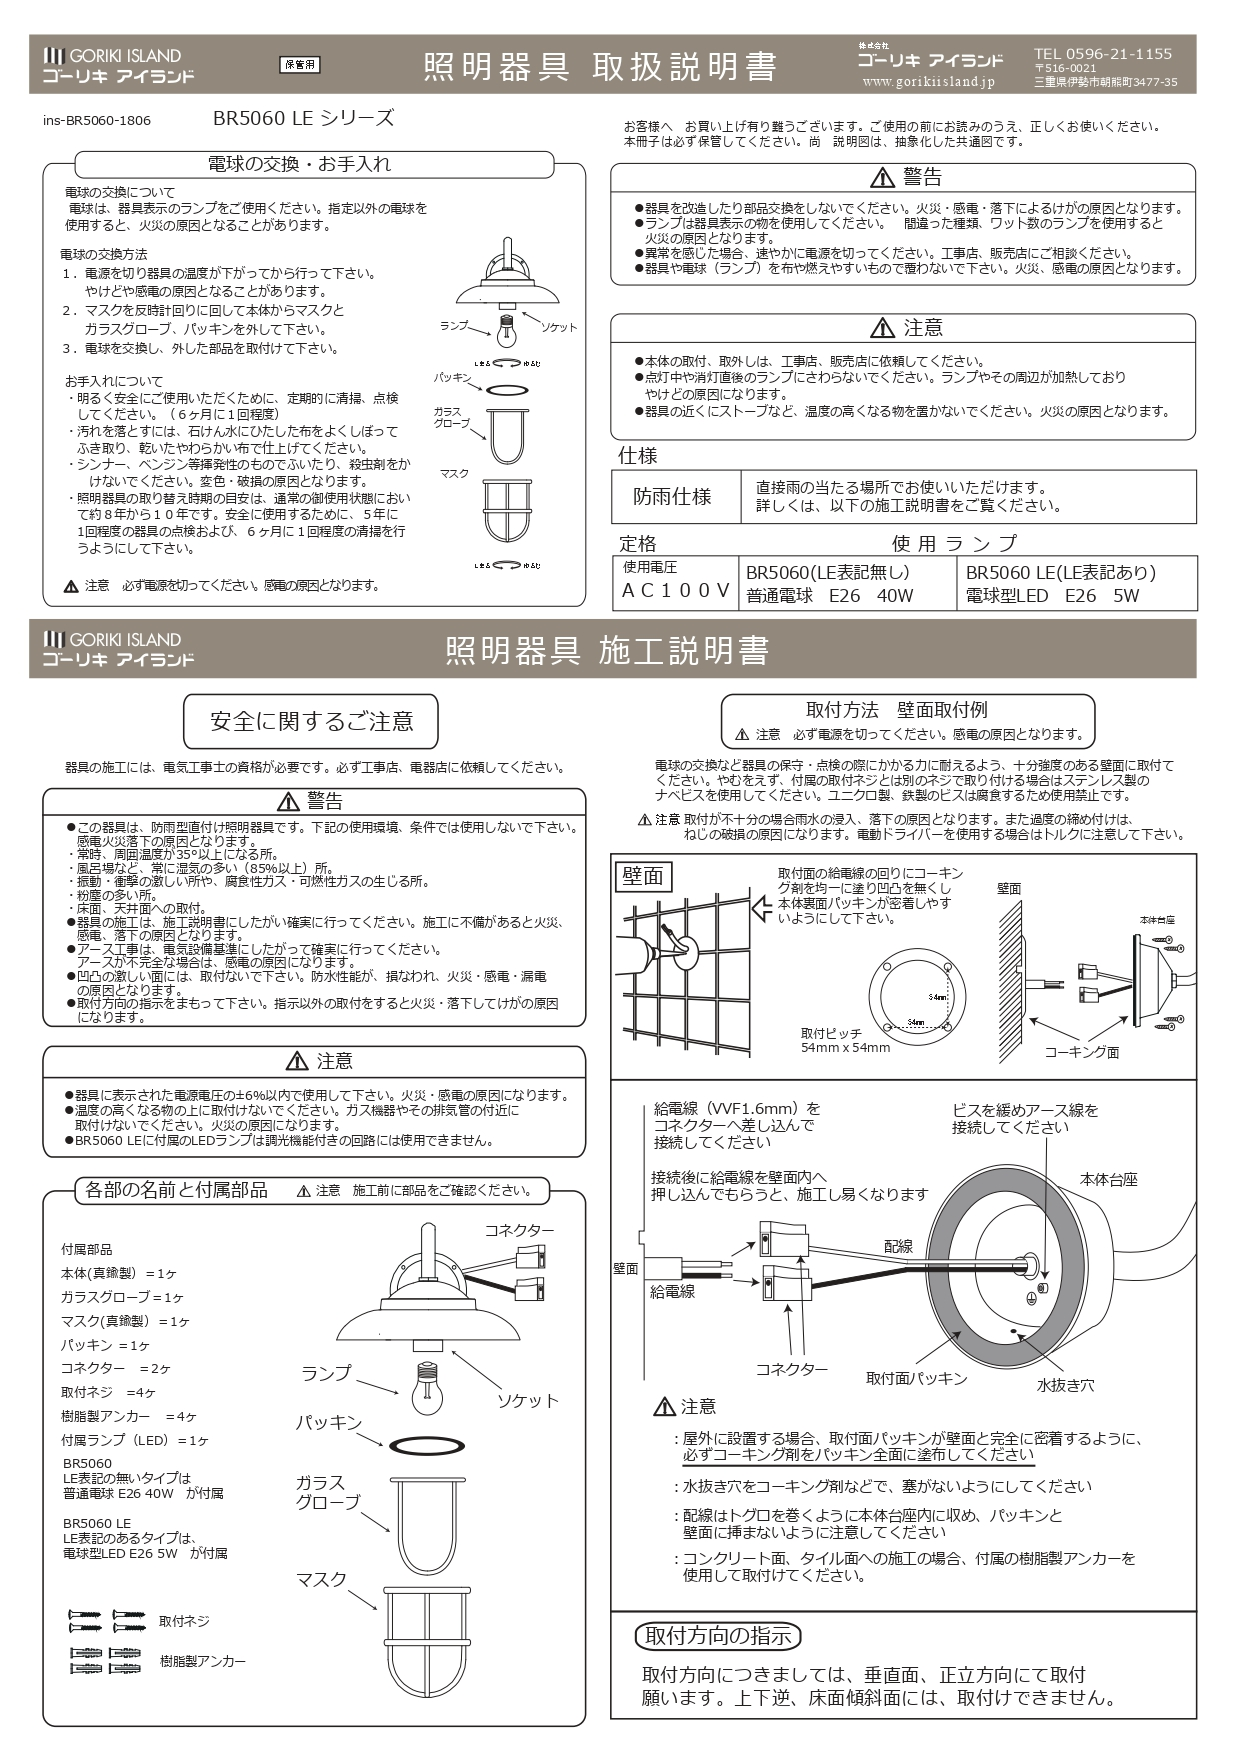 BR5060 BK Lilja 取扱説明書_page-0001